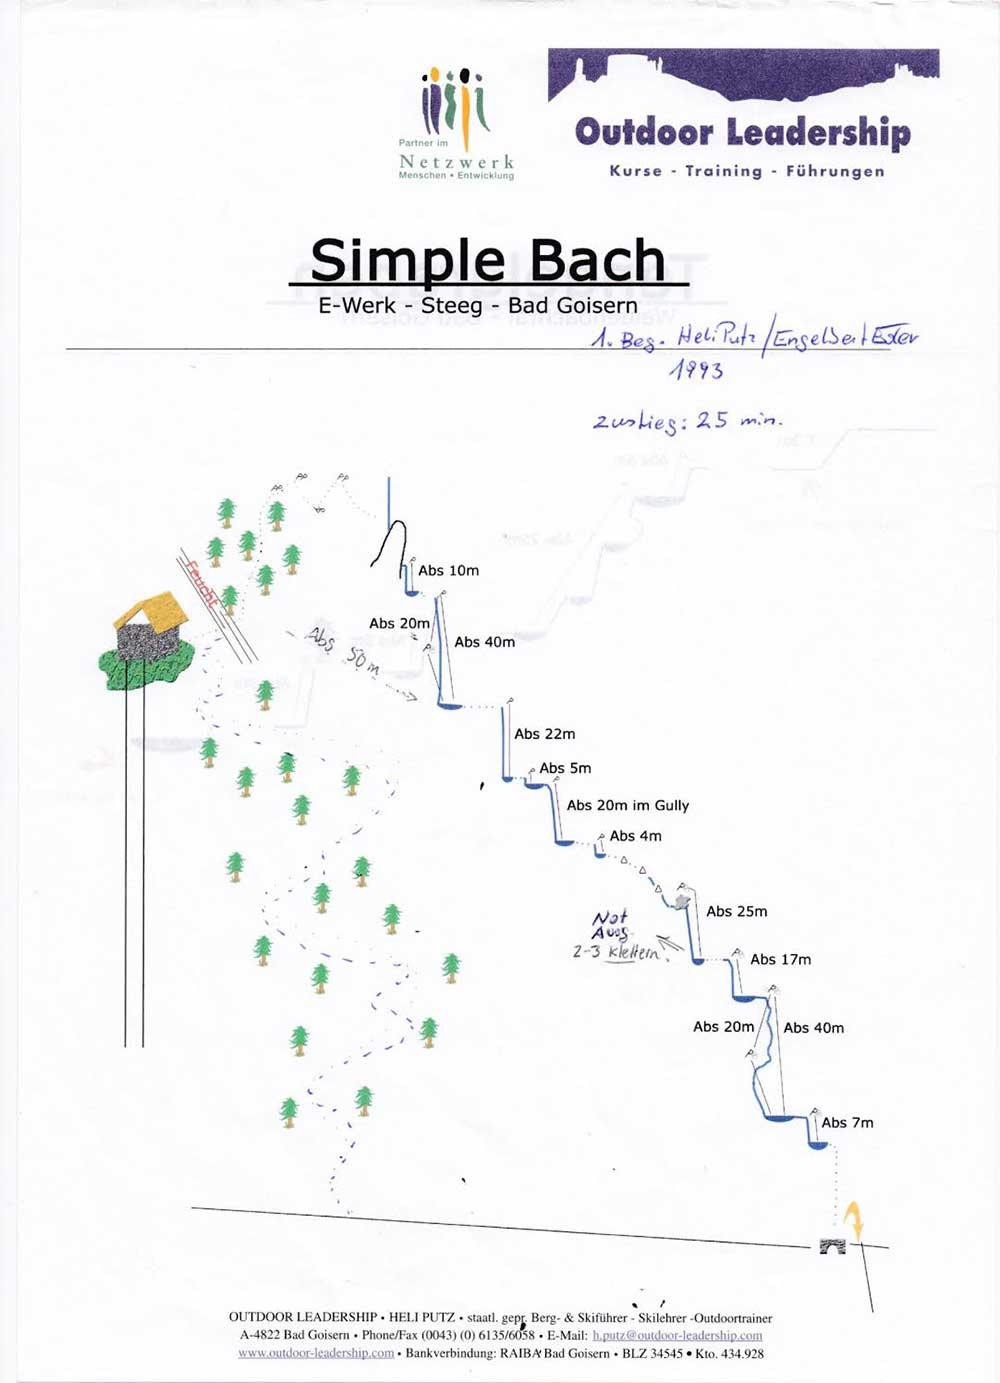 Bad Goisern - Canyoning - Simple Bach